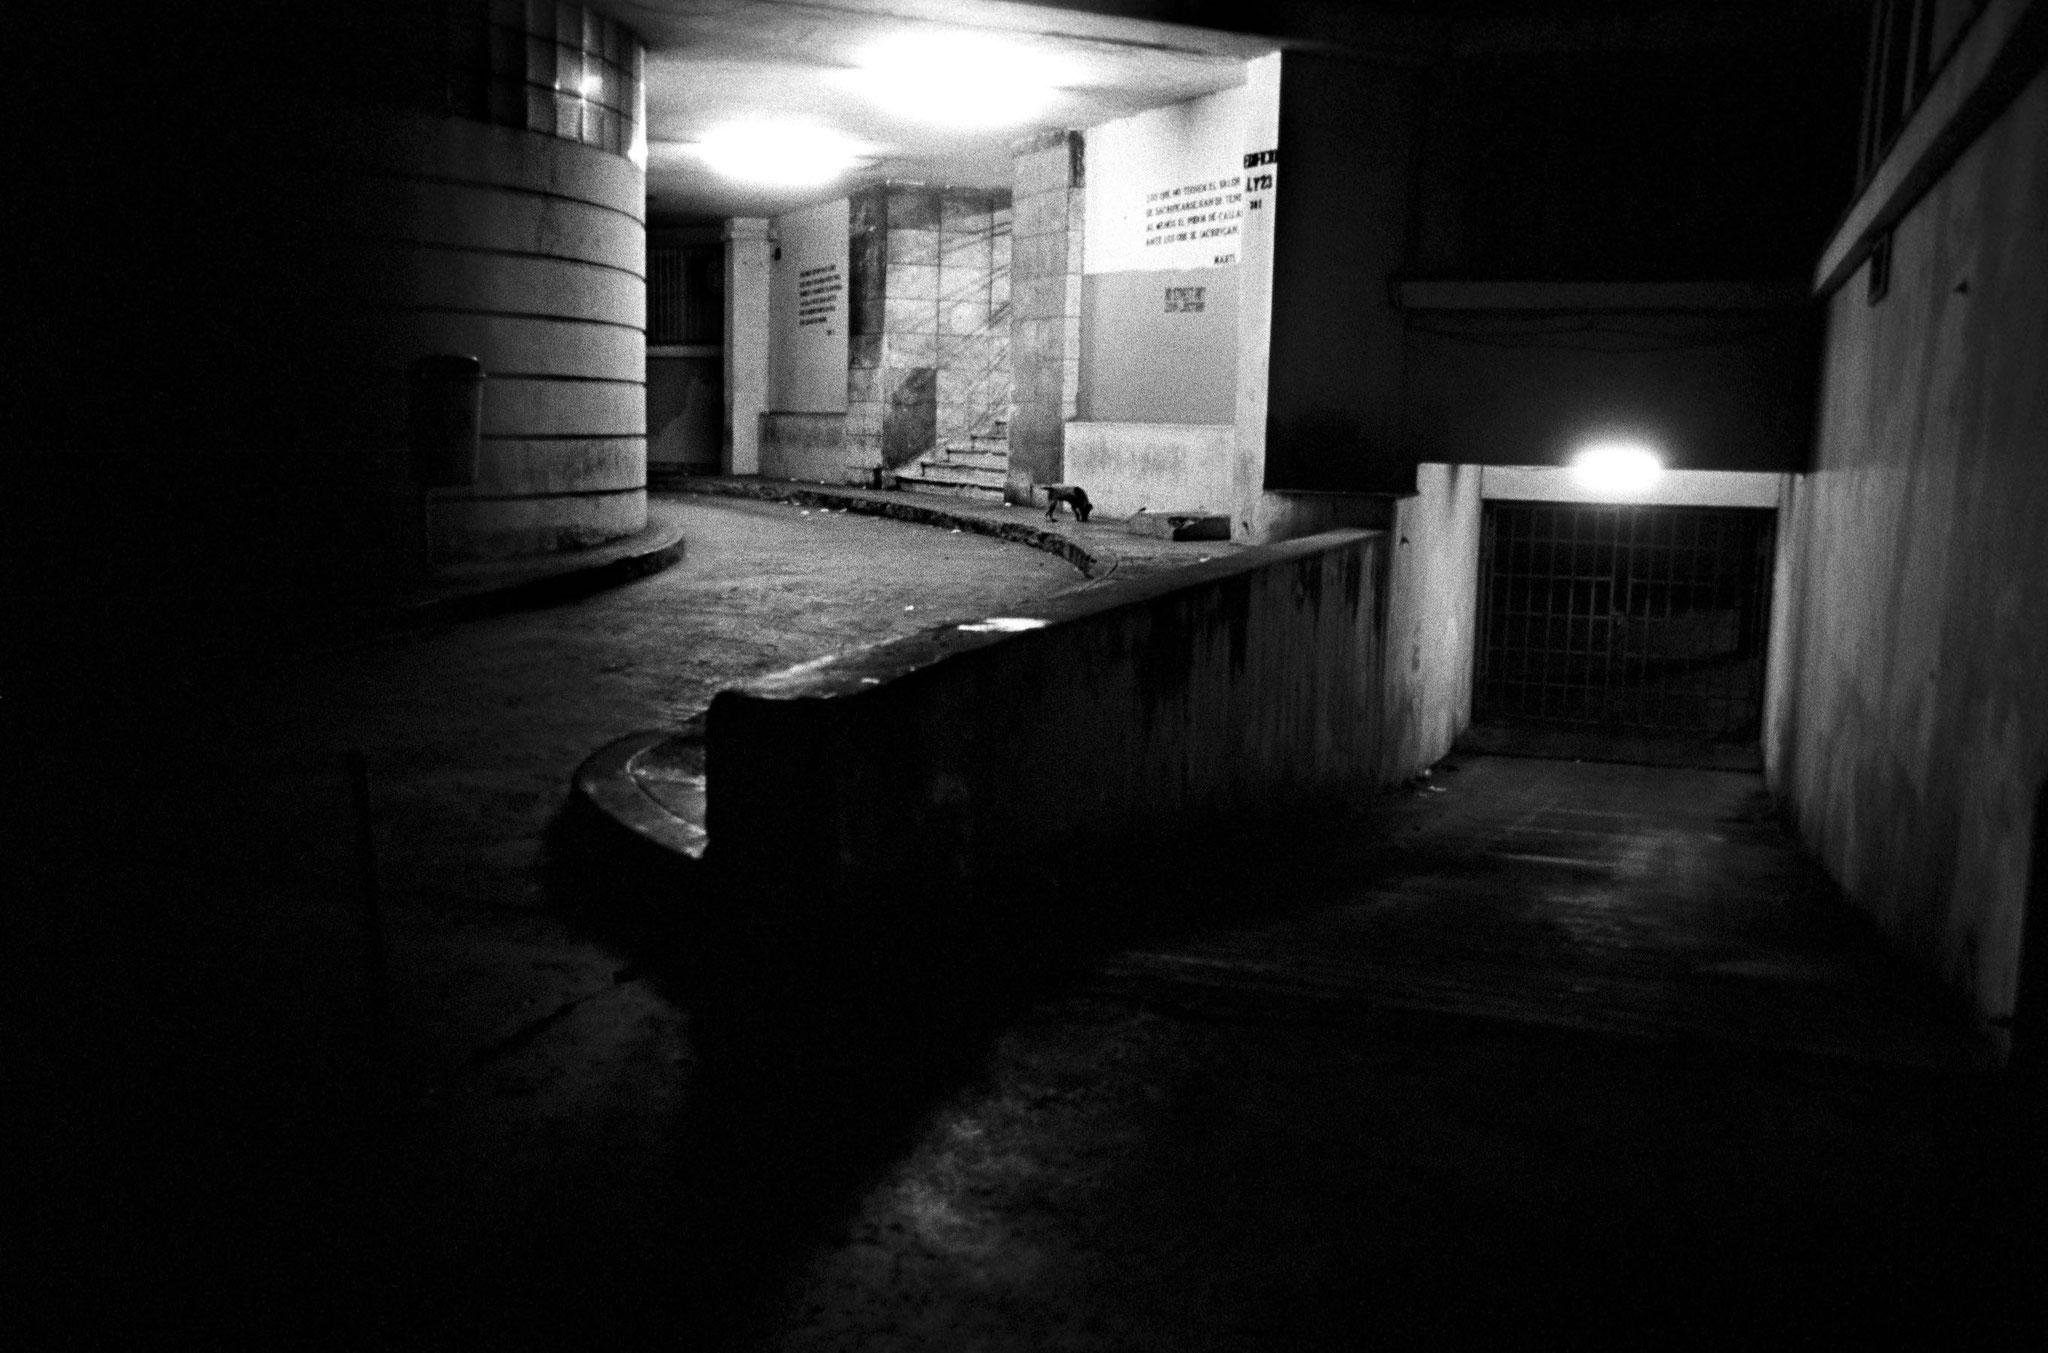 © Itziar Leemans